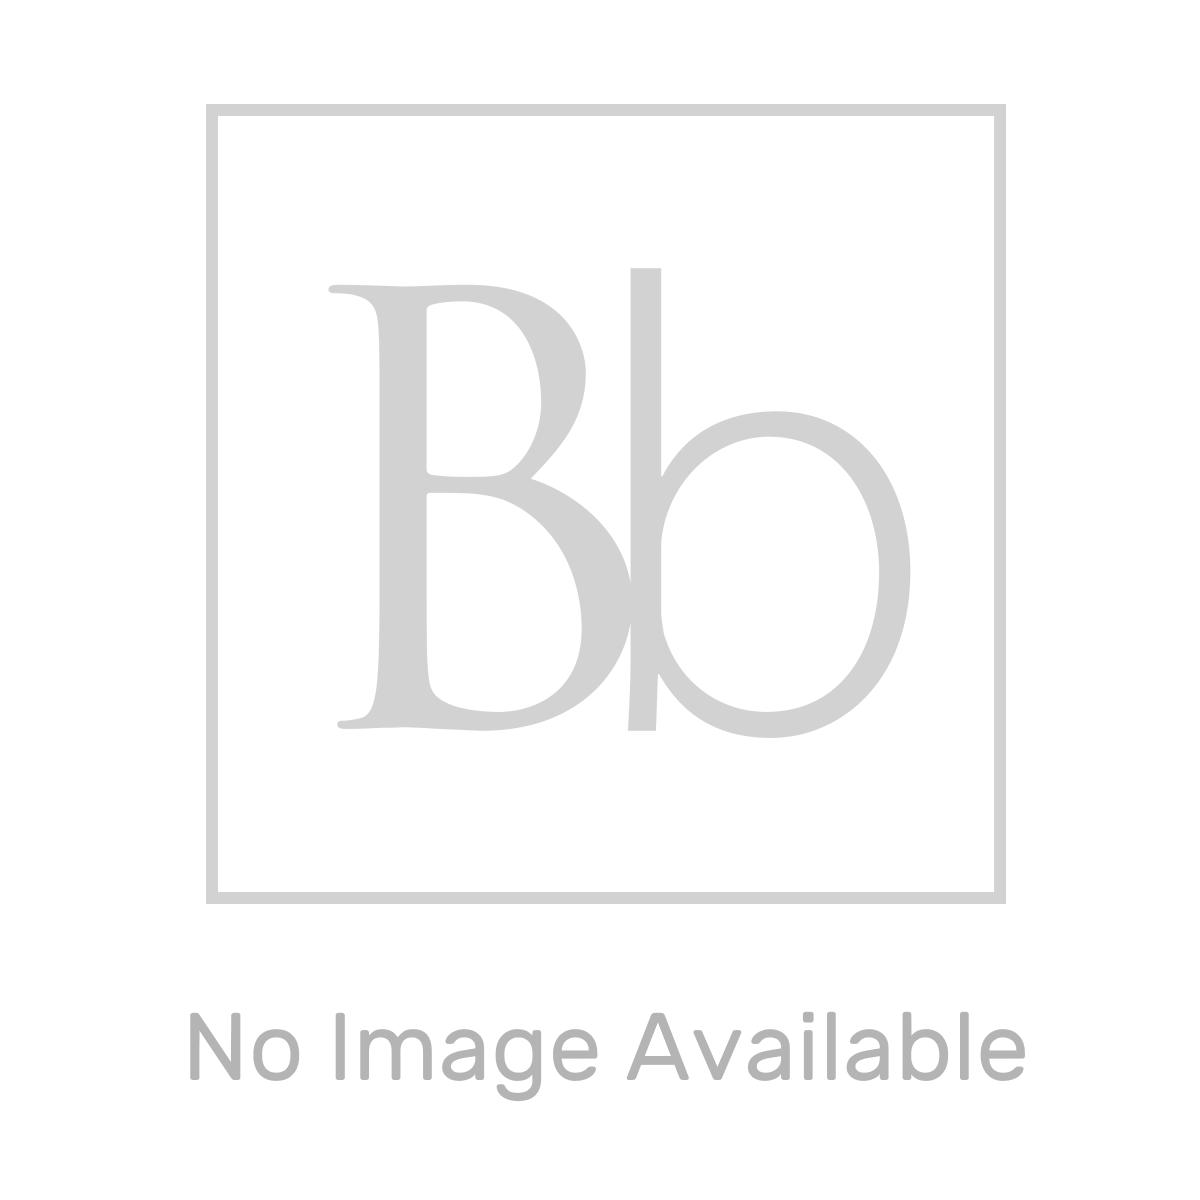 RAK Metropolitan Rimless Back To Wall Toilet with Soft Close Seat Measurements